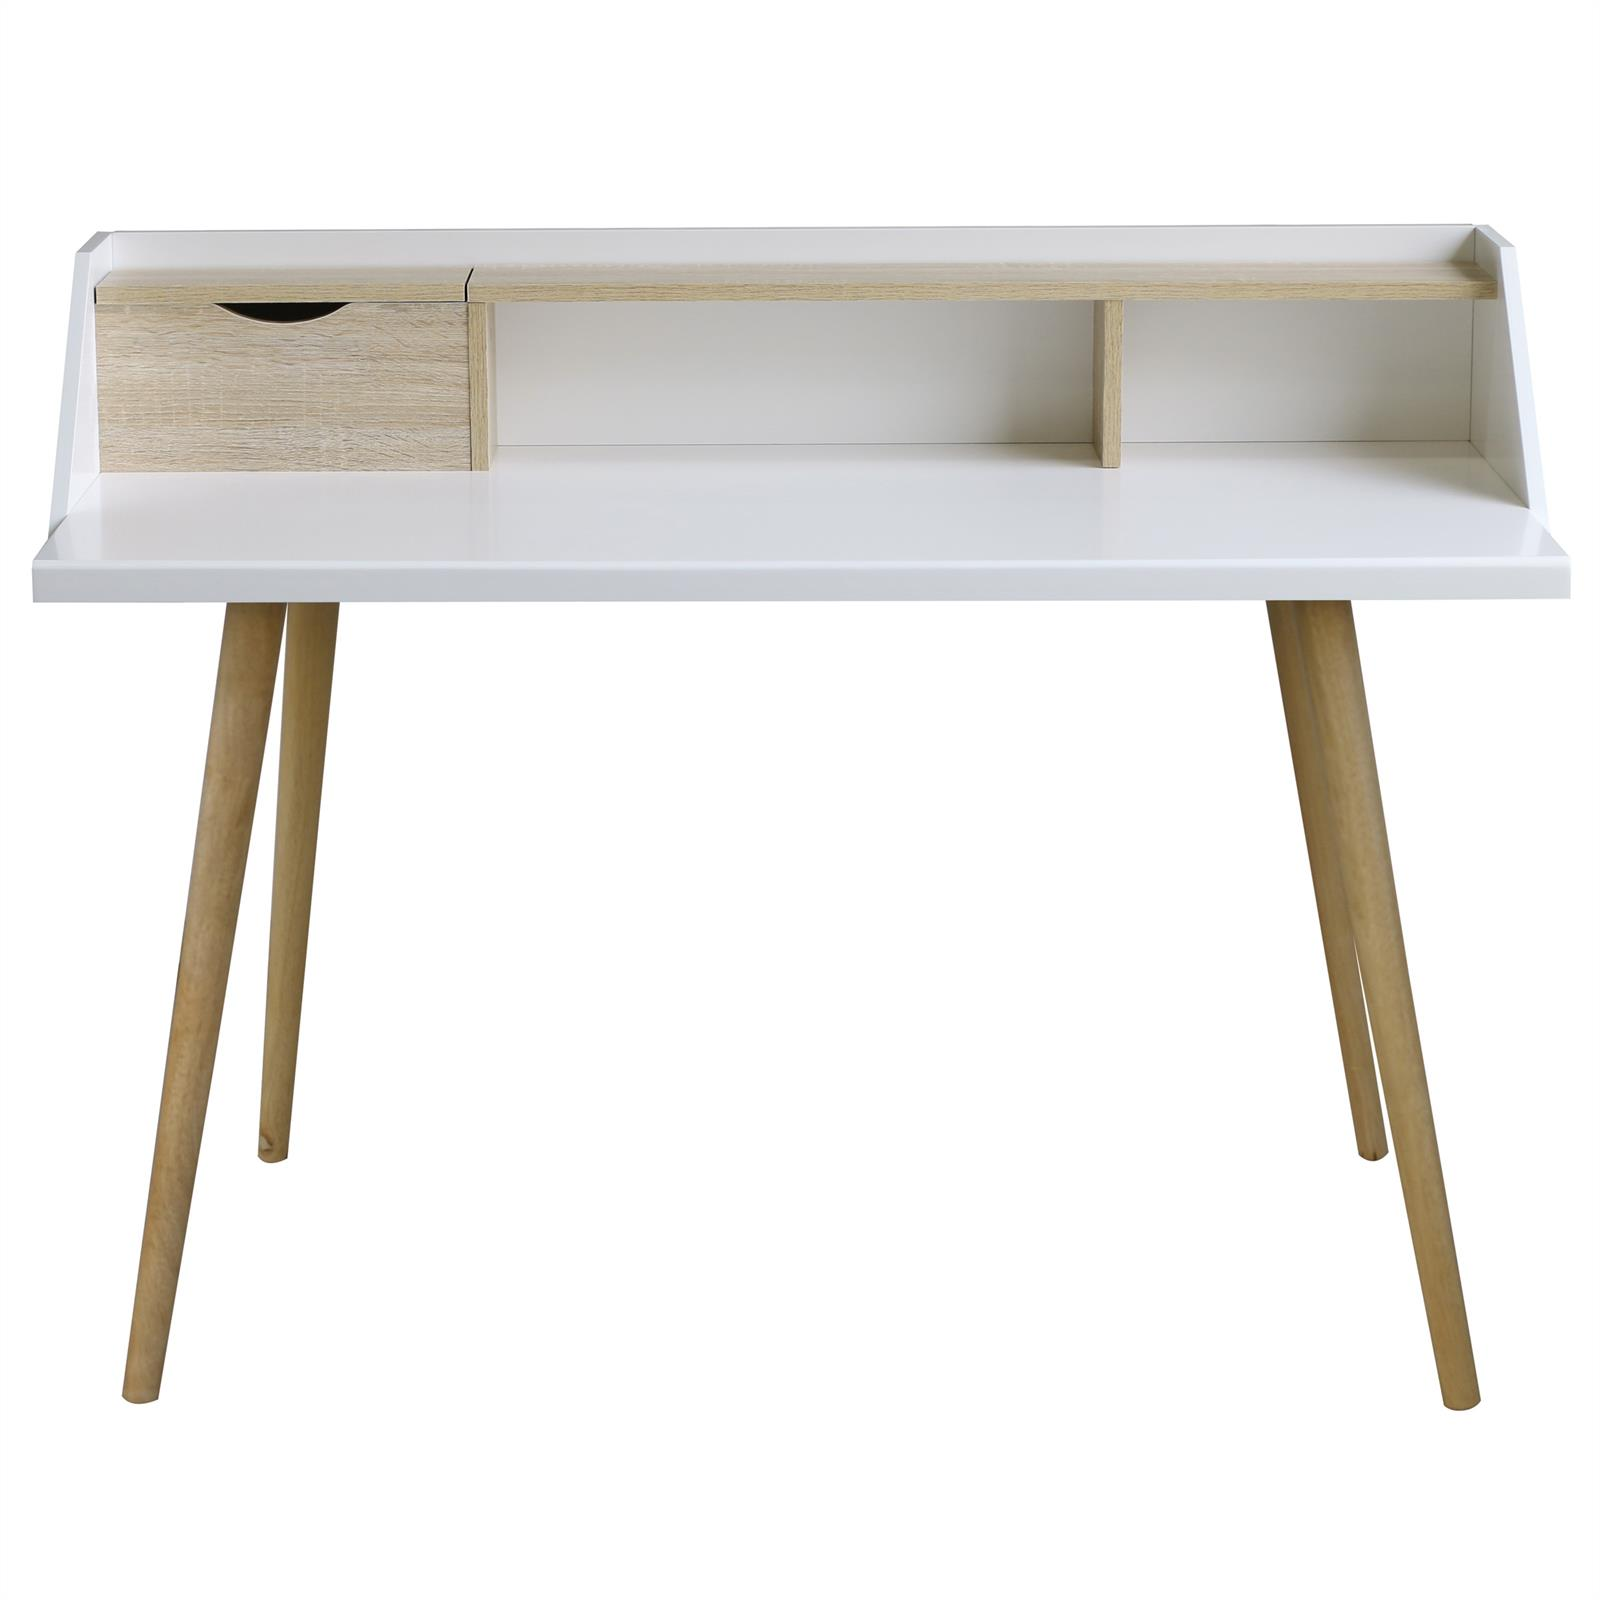 konsolentisch sekret r joan sonoma eiche wei mobilia24. Black Bedroom Furniture Sets. Home Design Ideas